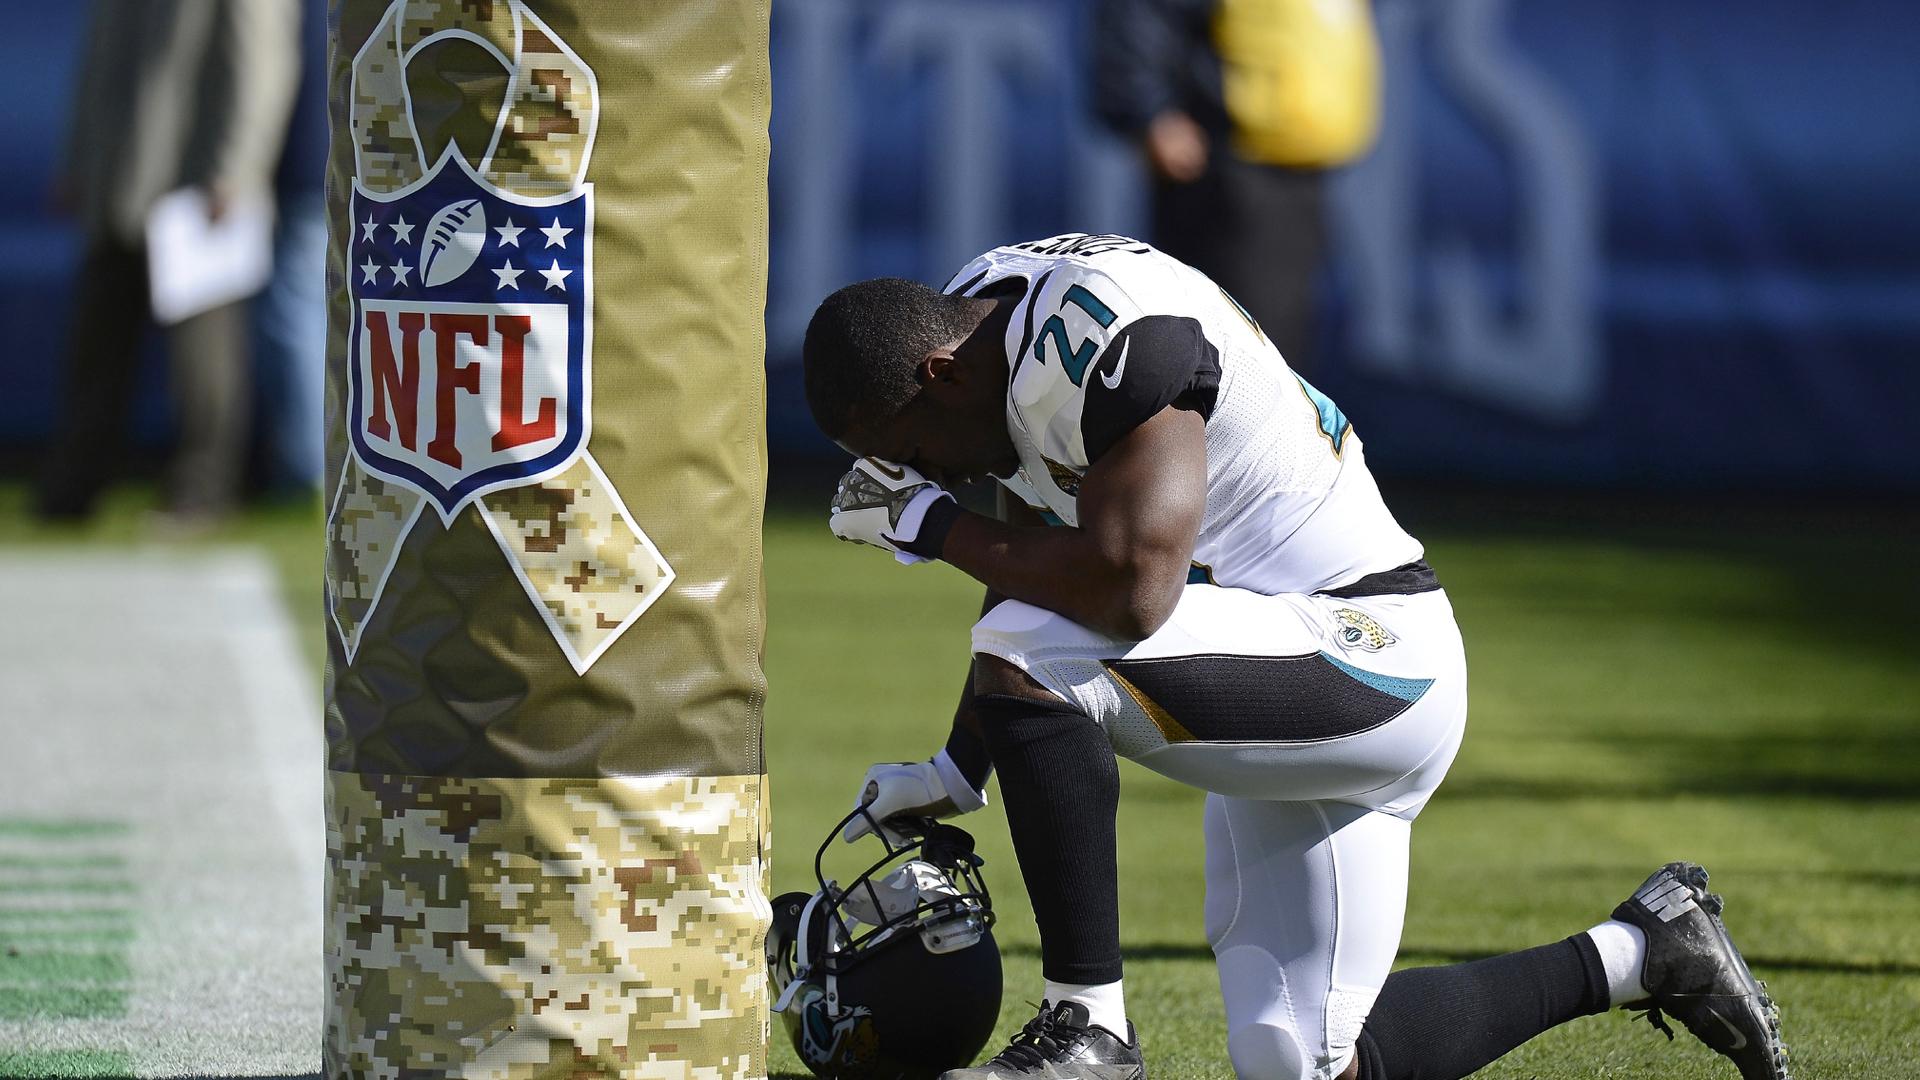 NFL Salute Identity 1.jpg